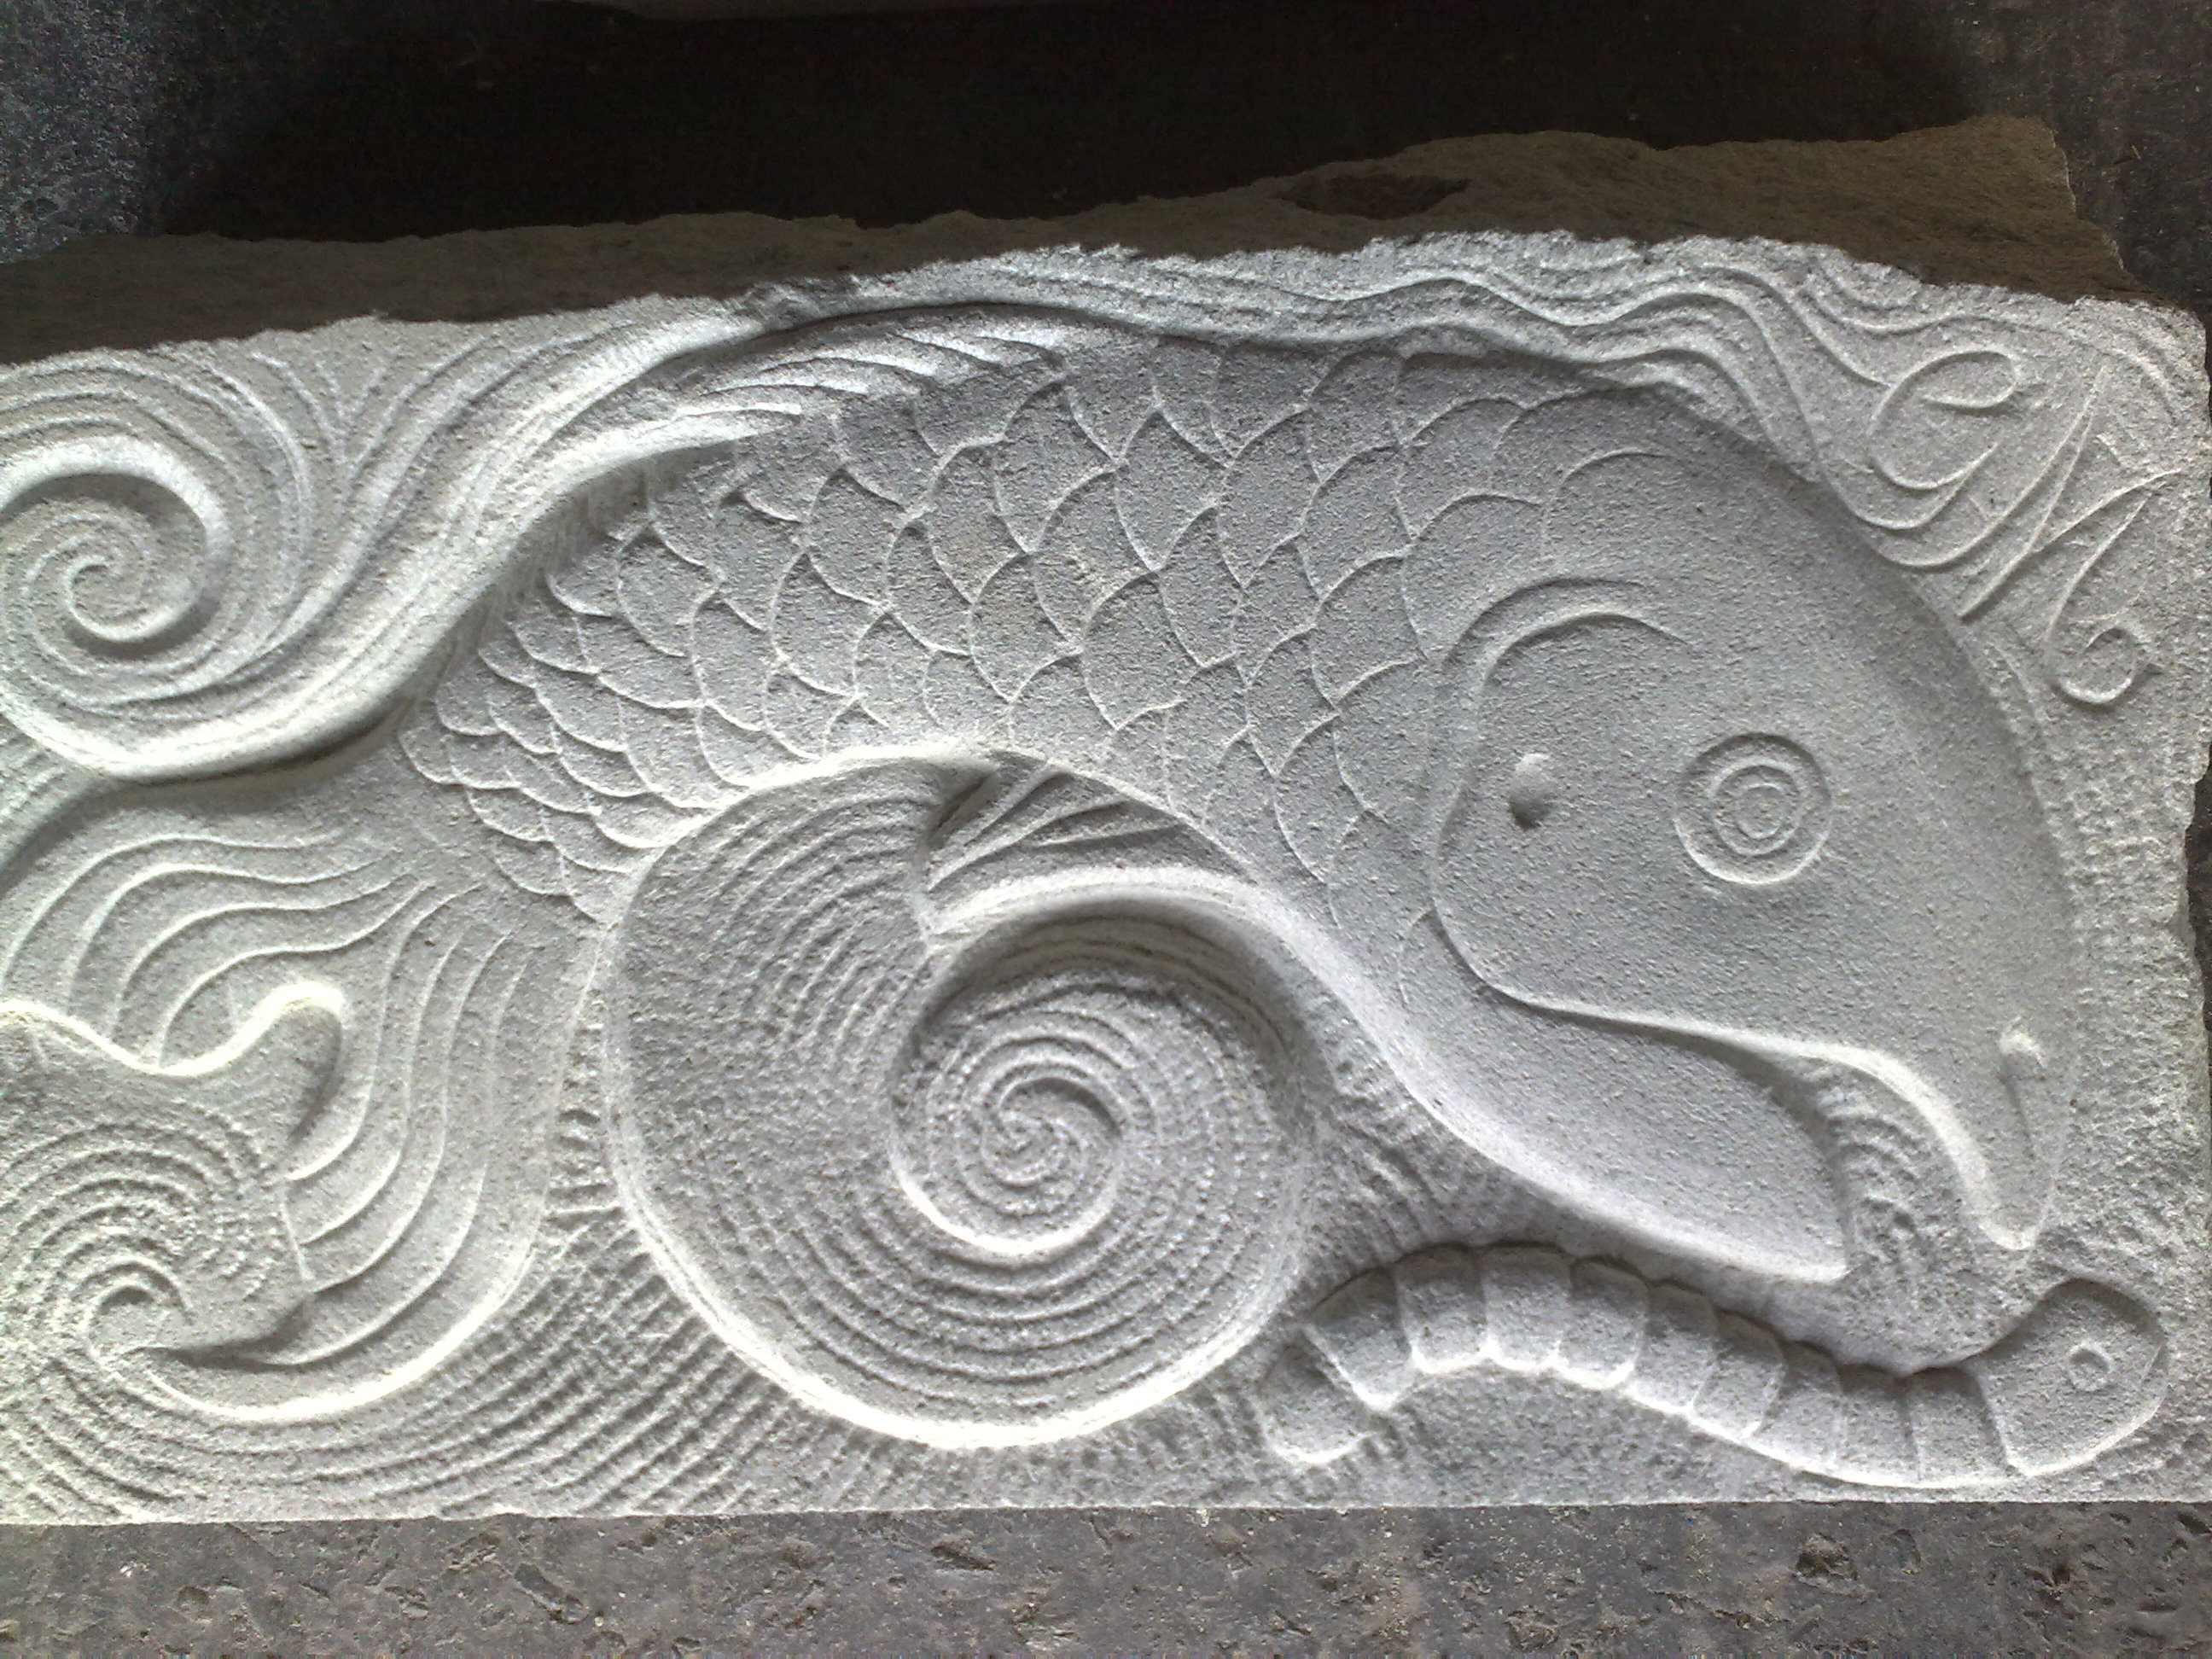 Isle of sleepy graeme mitcheson stone sculptor